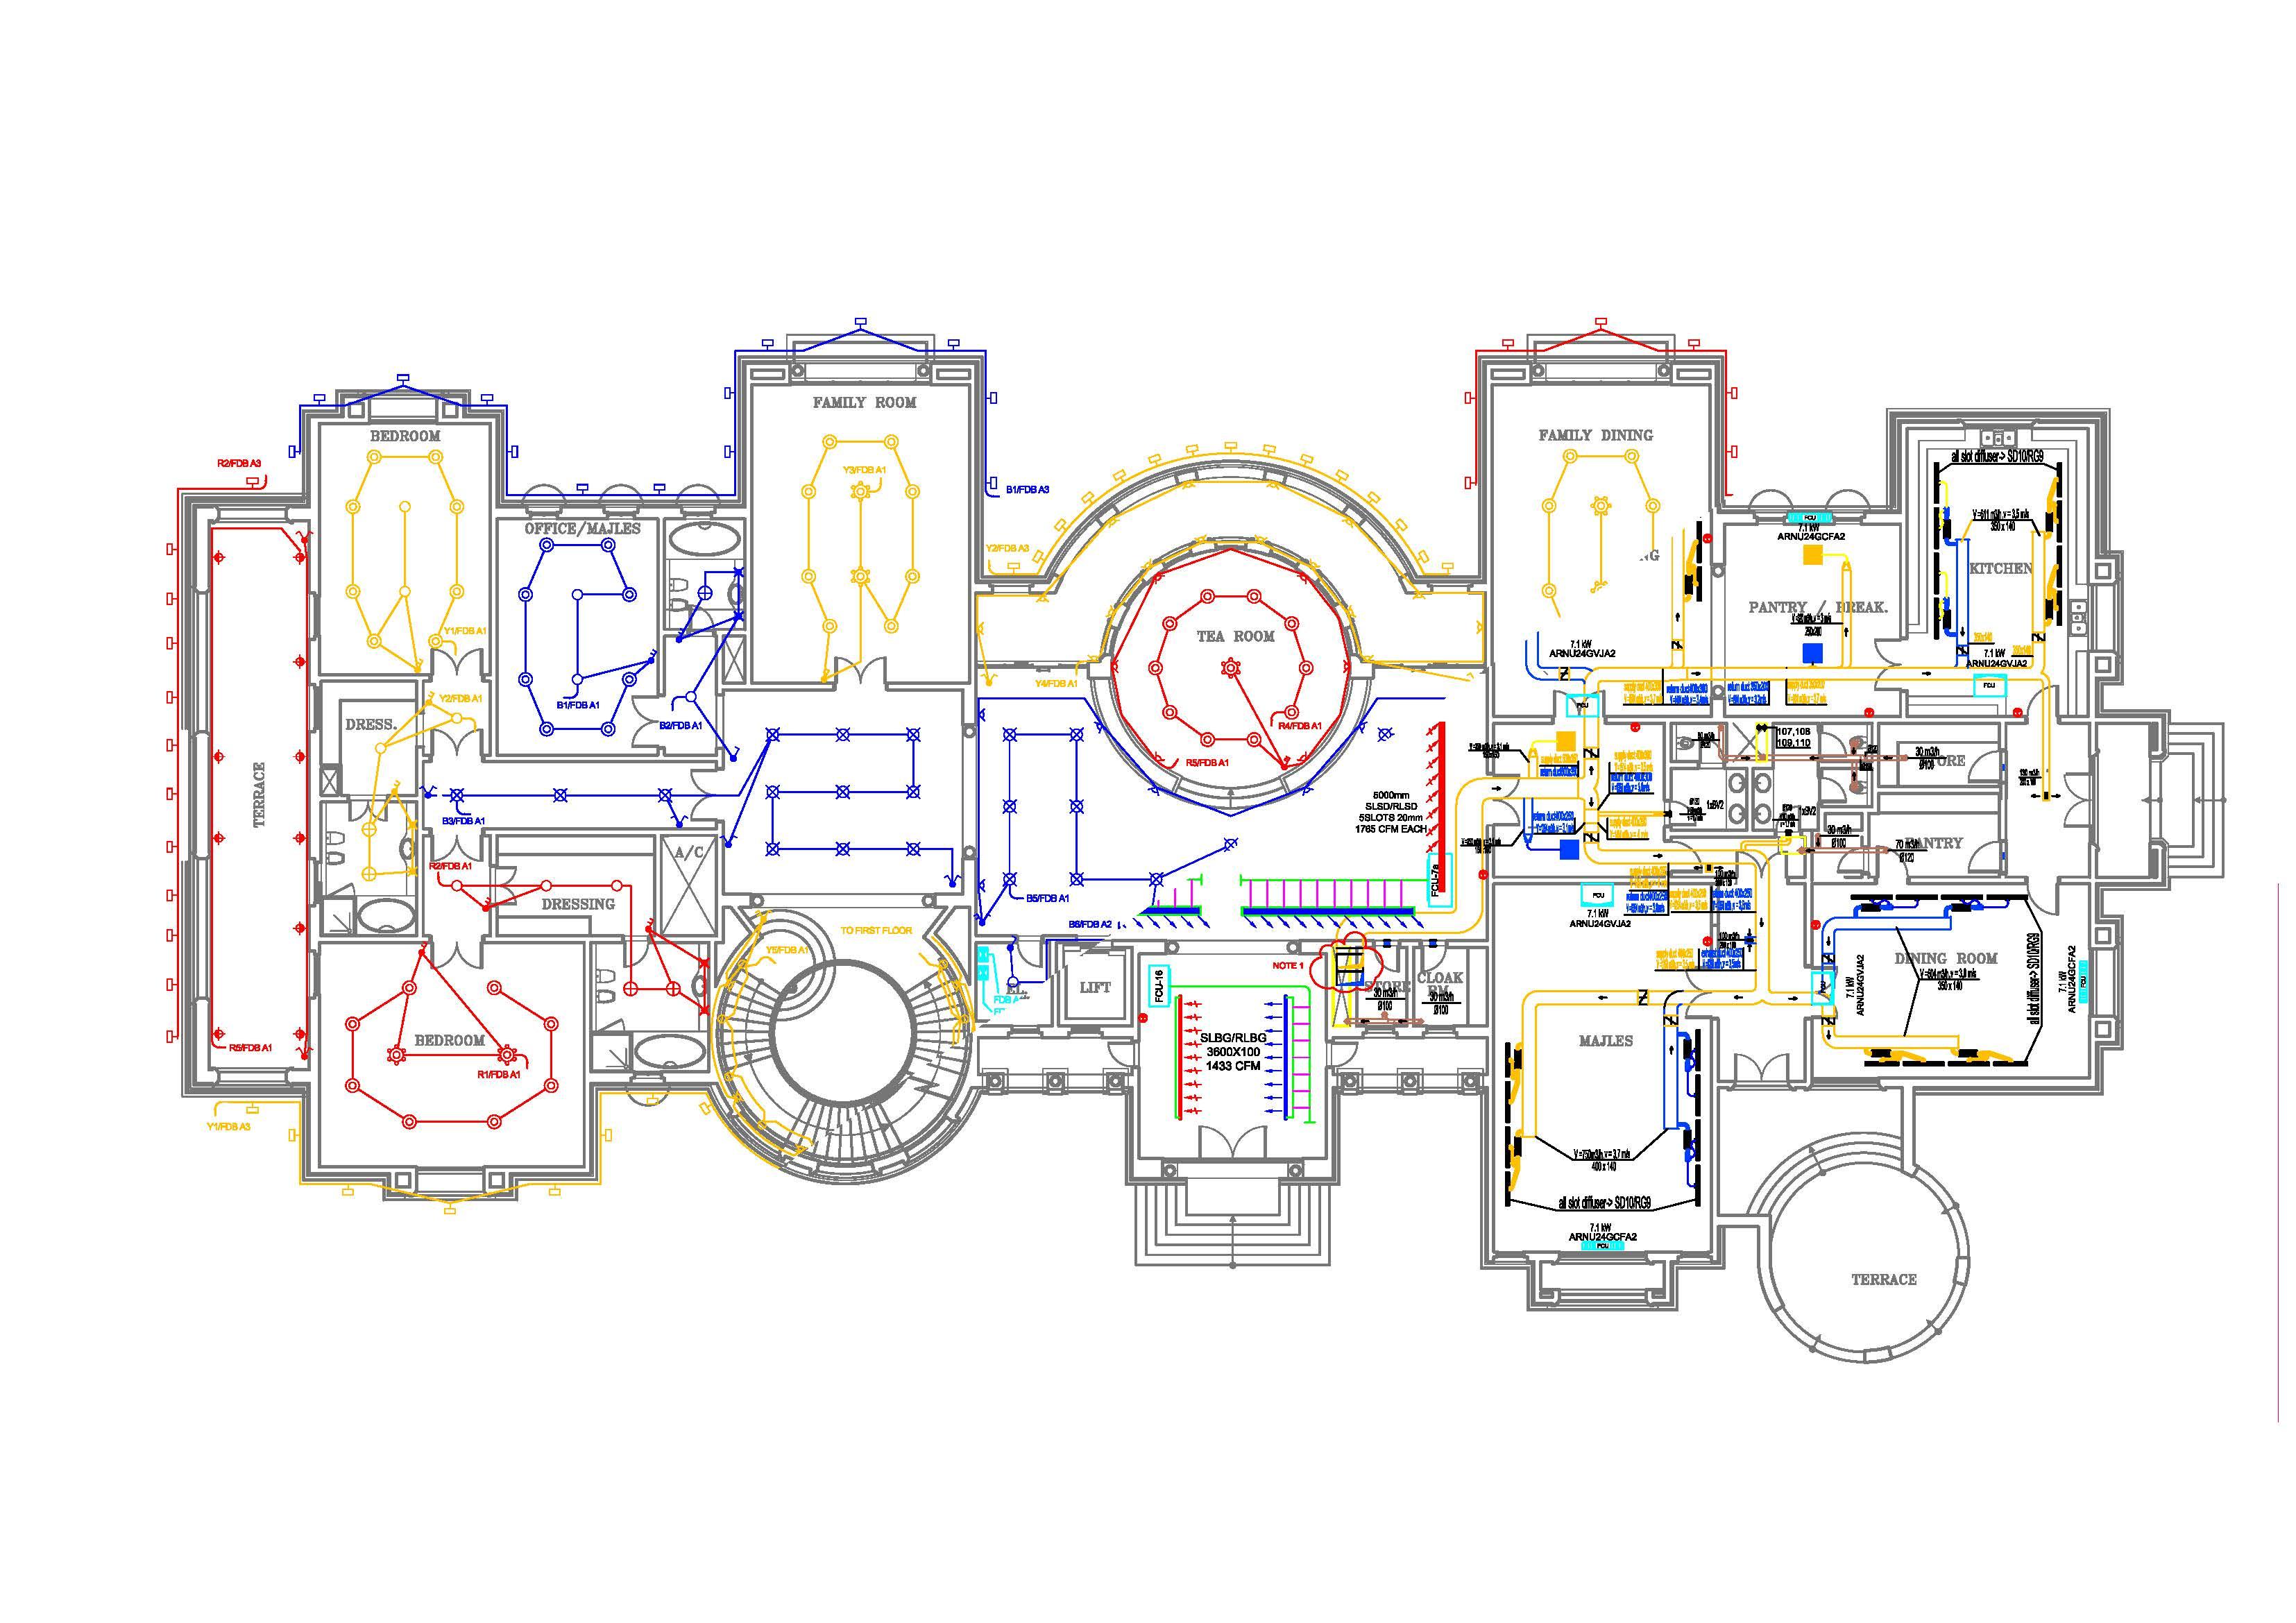 House Electrical Plans Dwg - Escortsea